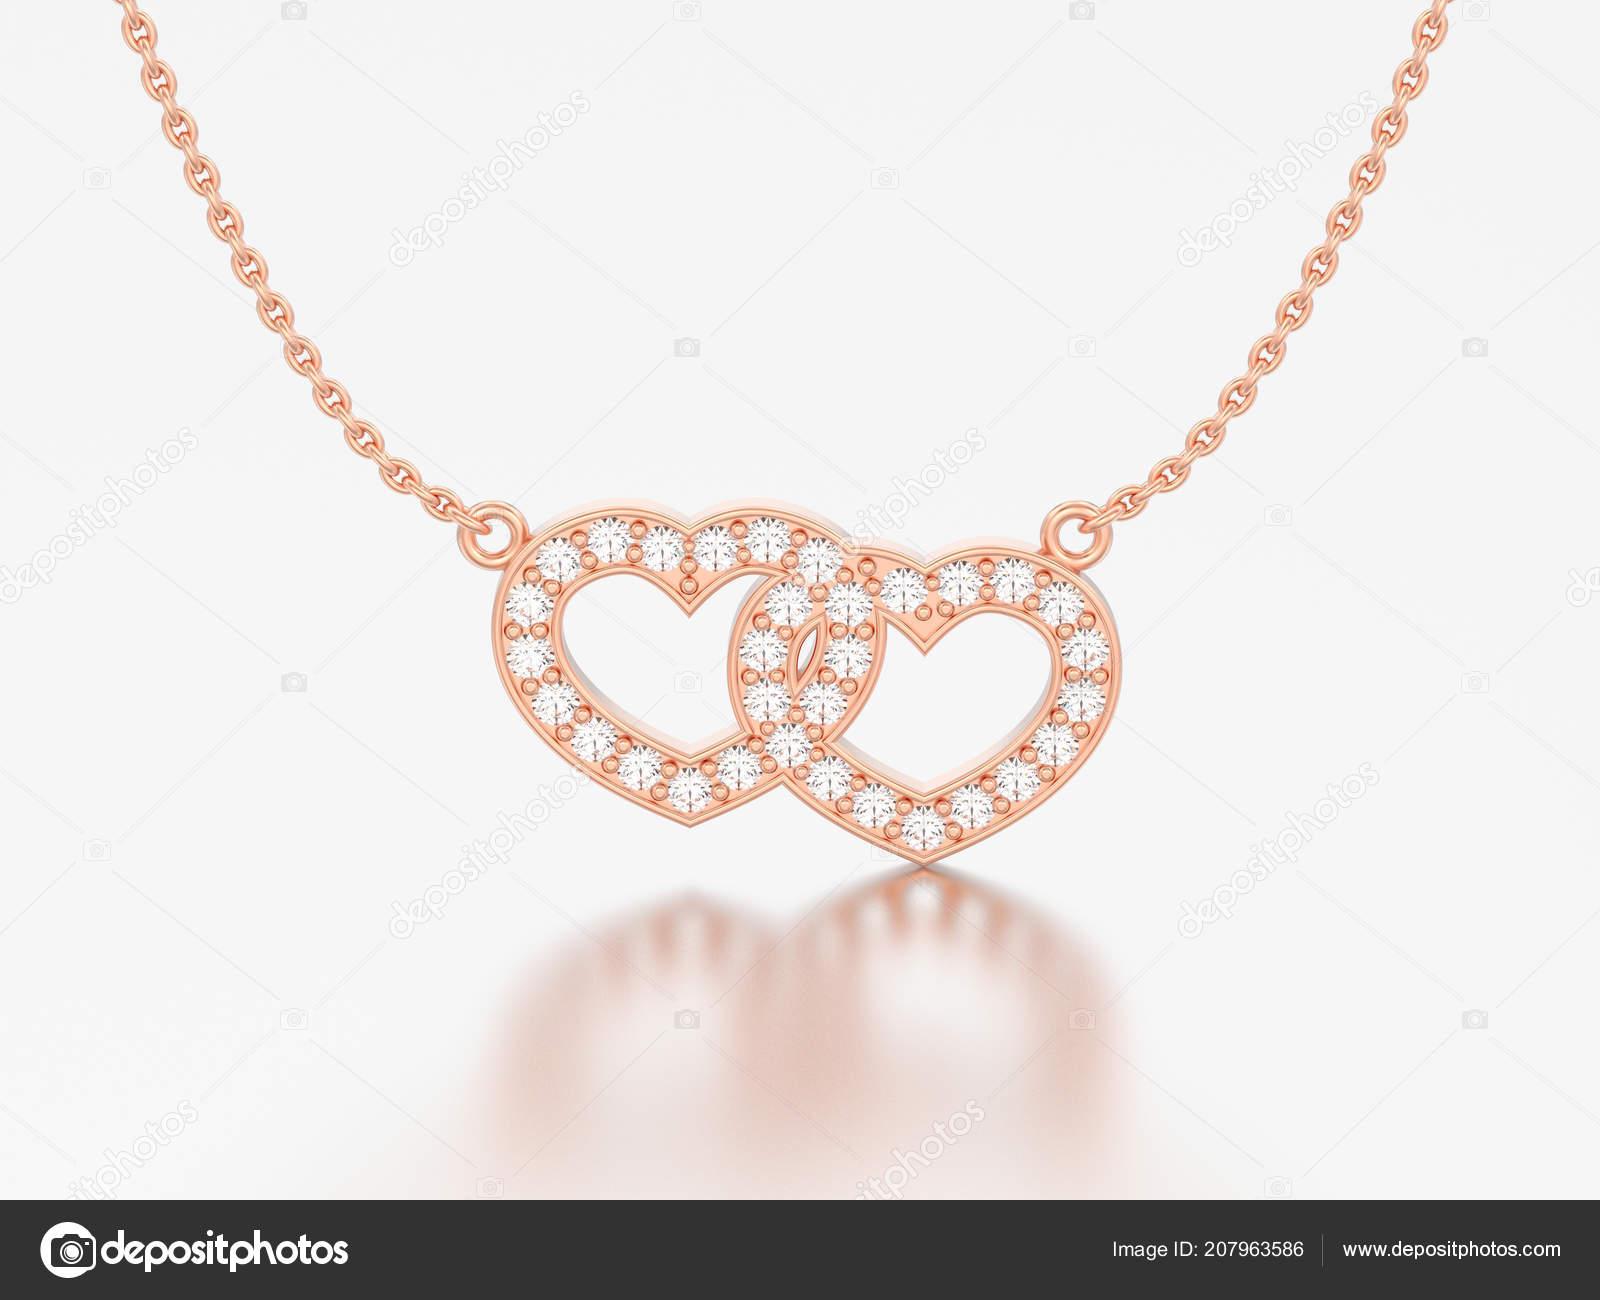 766d2d56ee 3D απεικόνιση κοσμήματα δύο καρδιές κόκκινο τριαντάφυλλο χρυσού διαμαντένιο  κολιέ αλυσίδα σε γκρι φόντο– εικόνα αρχείου